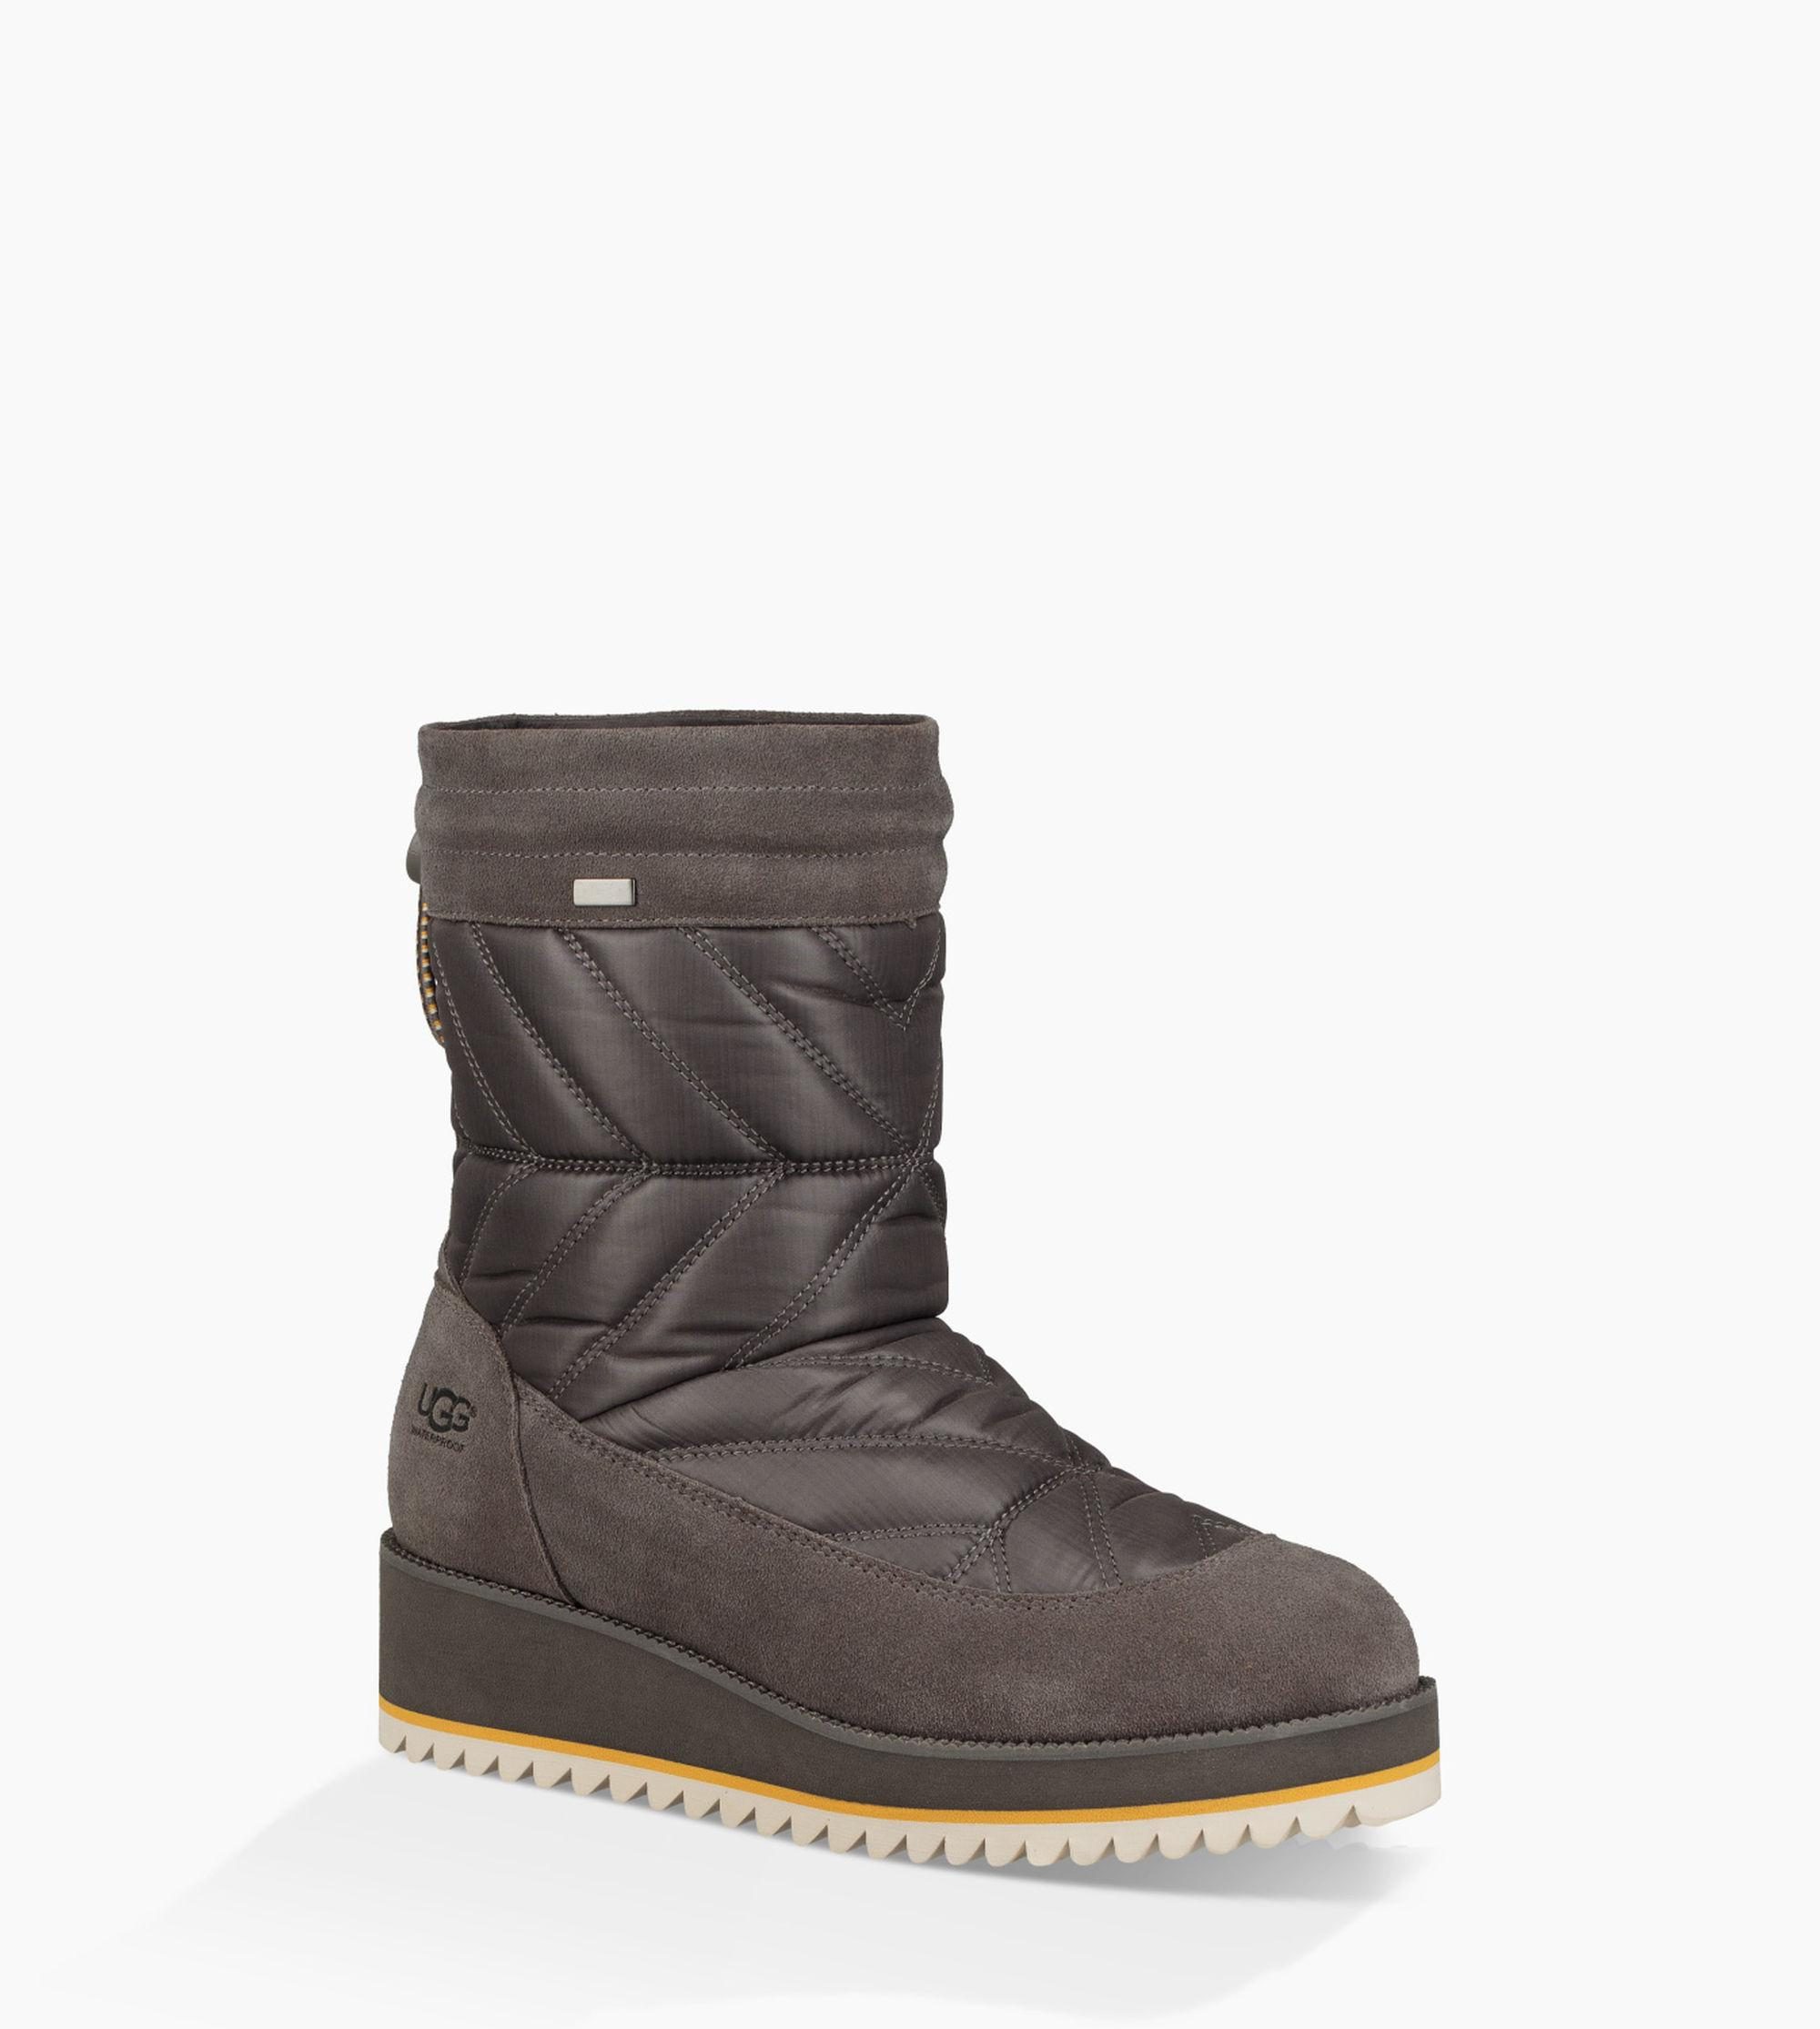 28b5650896e Lyst - UGG Beck Boot Beck Boot in Gray